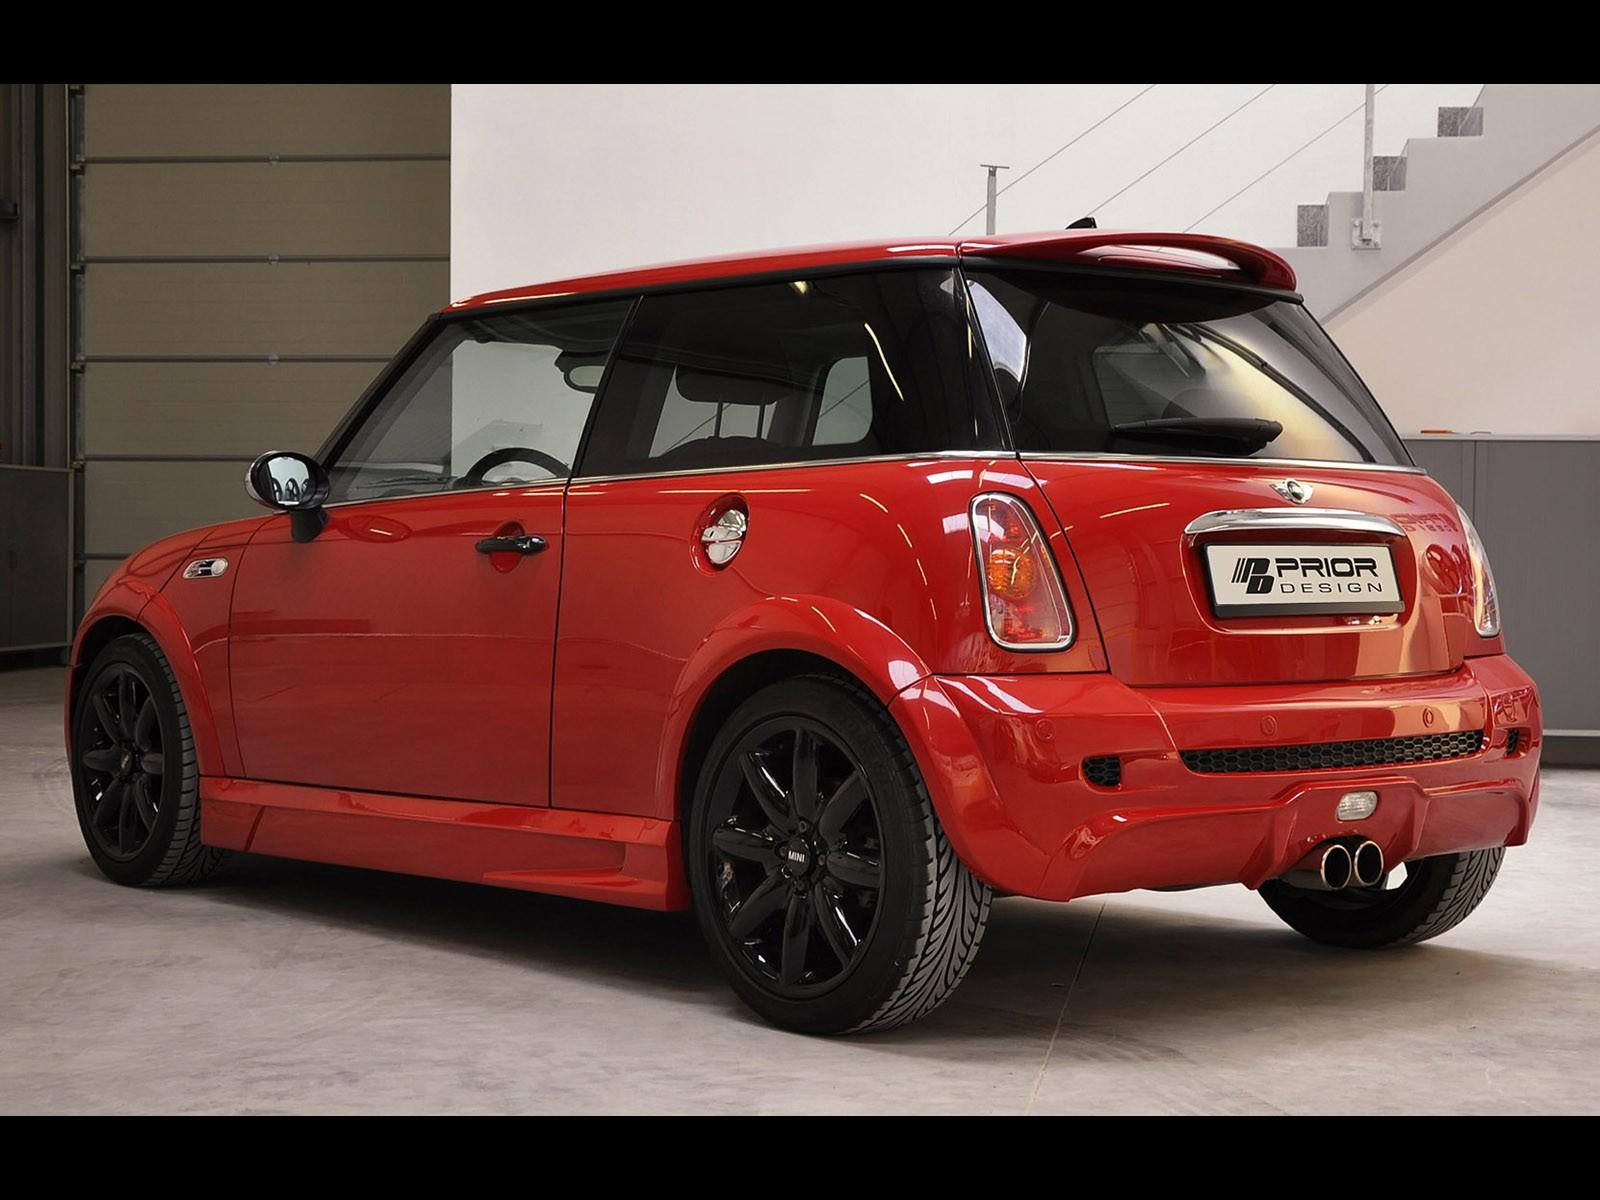 2012 Prior Design - Mini Cooper S Bodykit